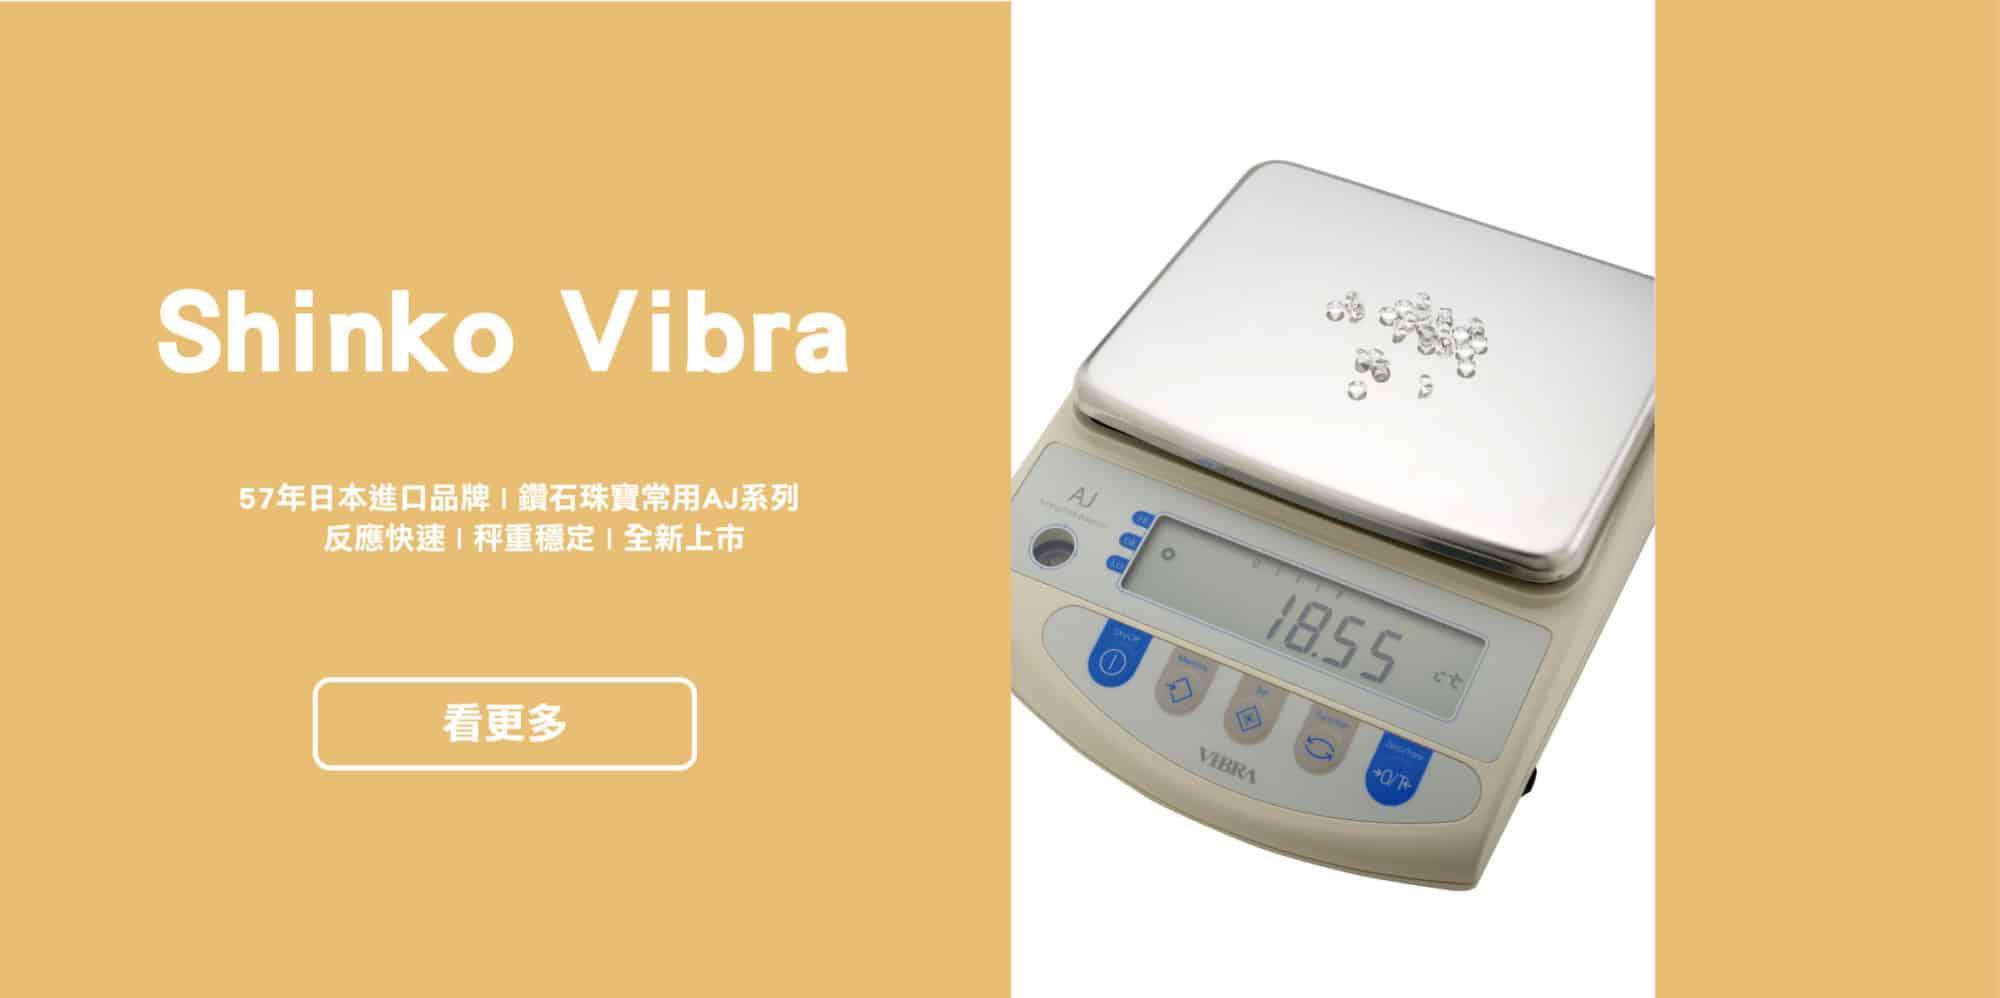 SHINKO VIBRA 日本 新光天秤 精密天平 珠寶秤 鑽石秤 金飾月 | 沛禮國際 Polit 電子秤專賣